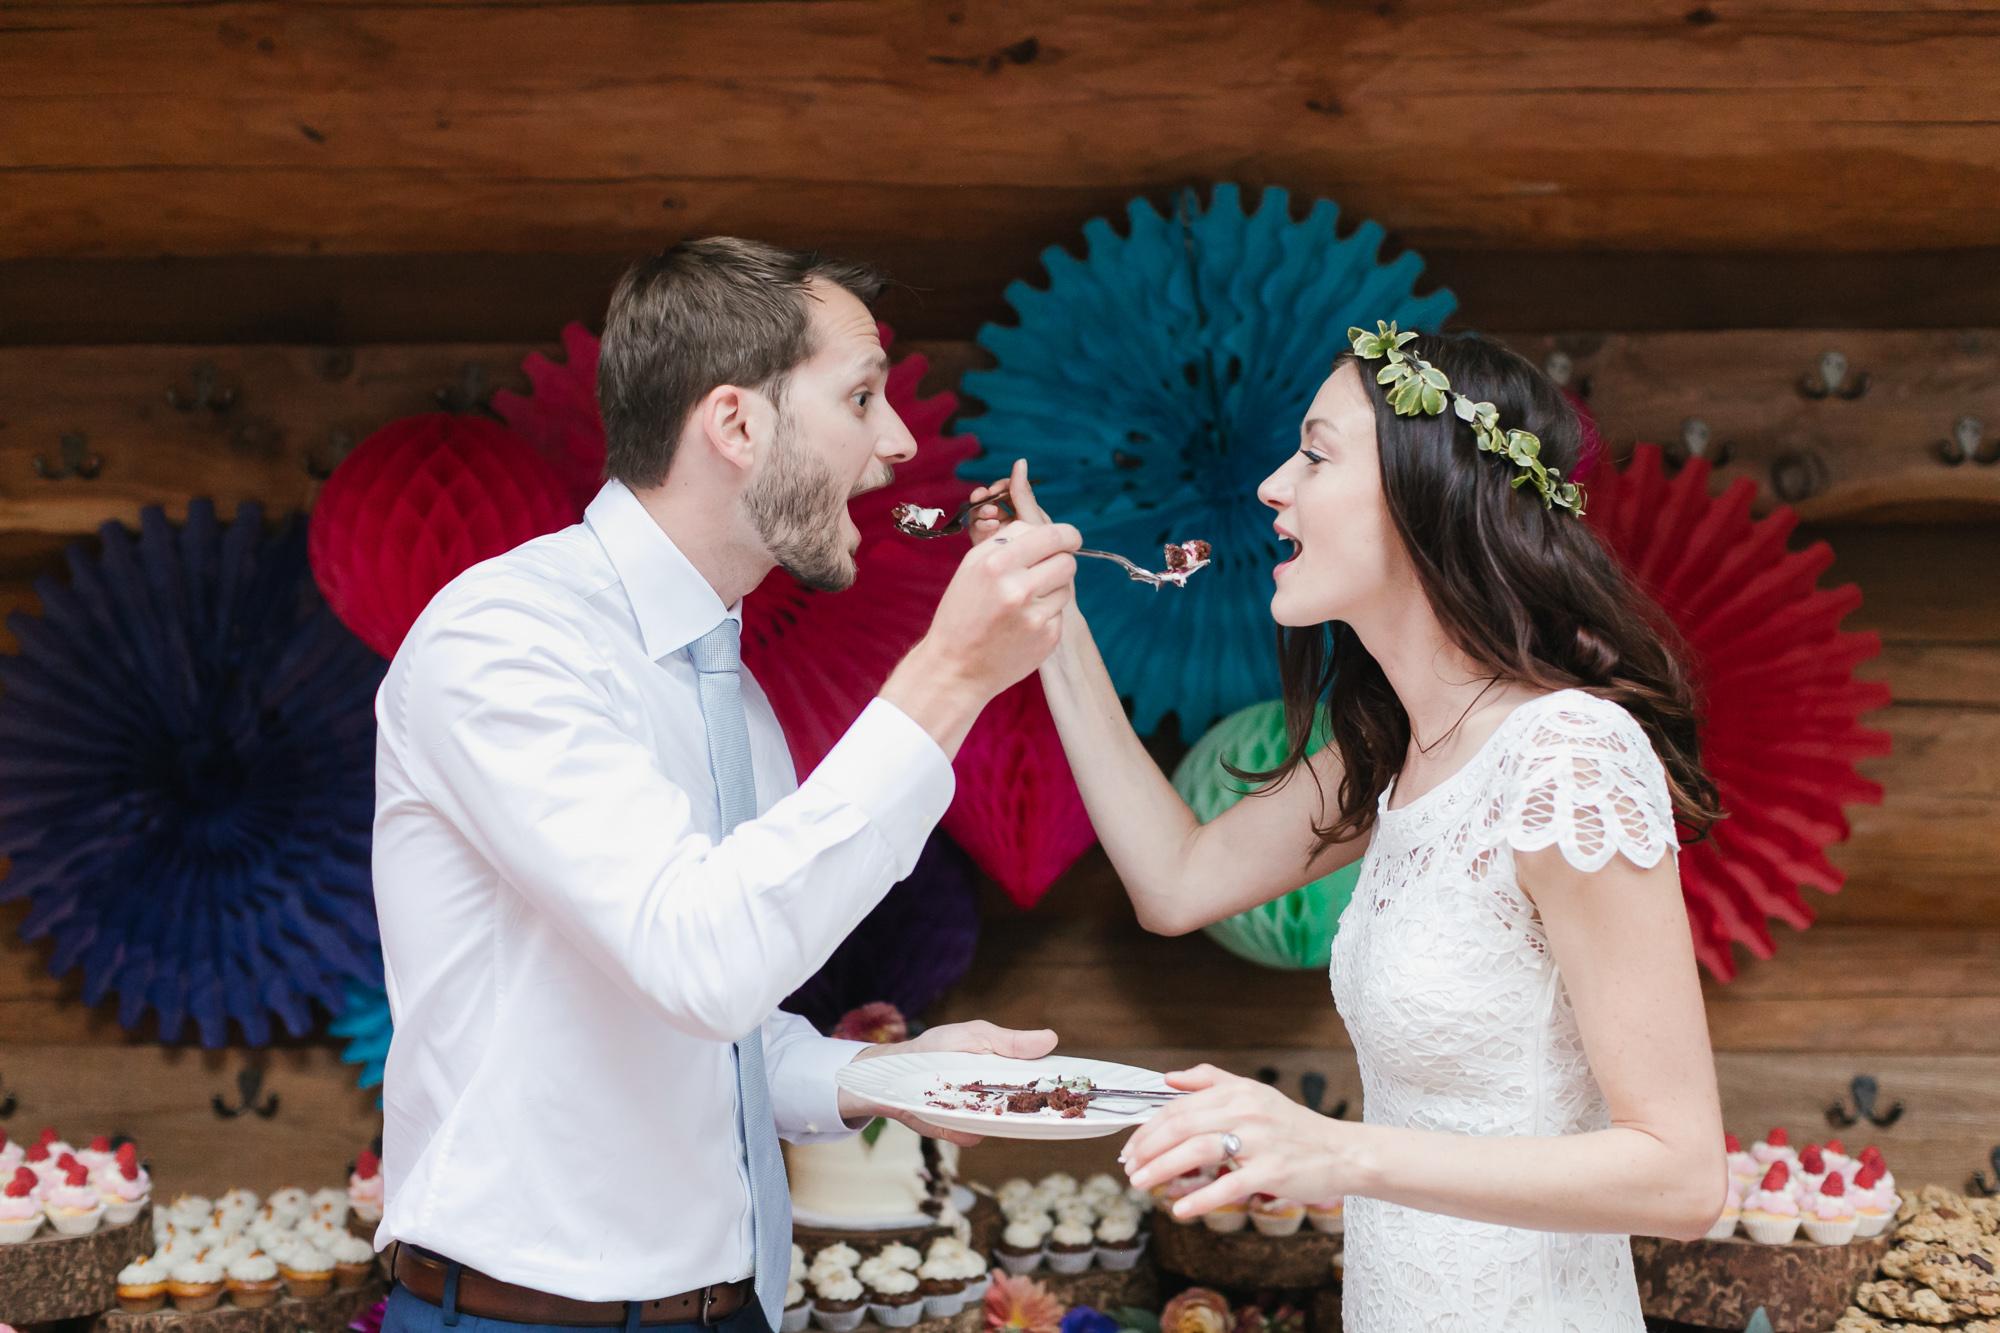 Wedding couple exchange bites of their wedding cake